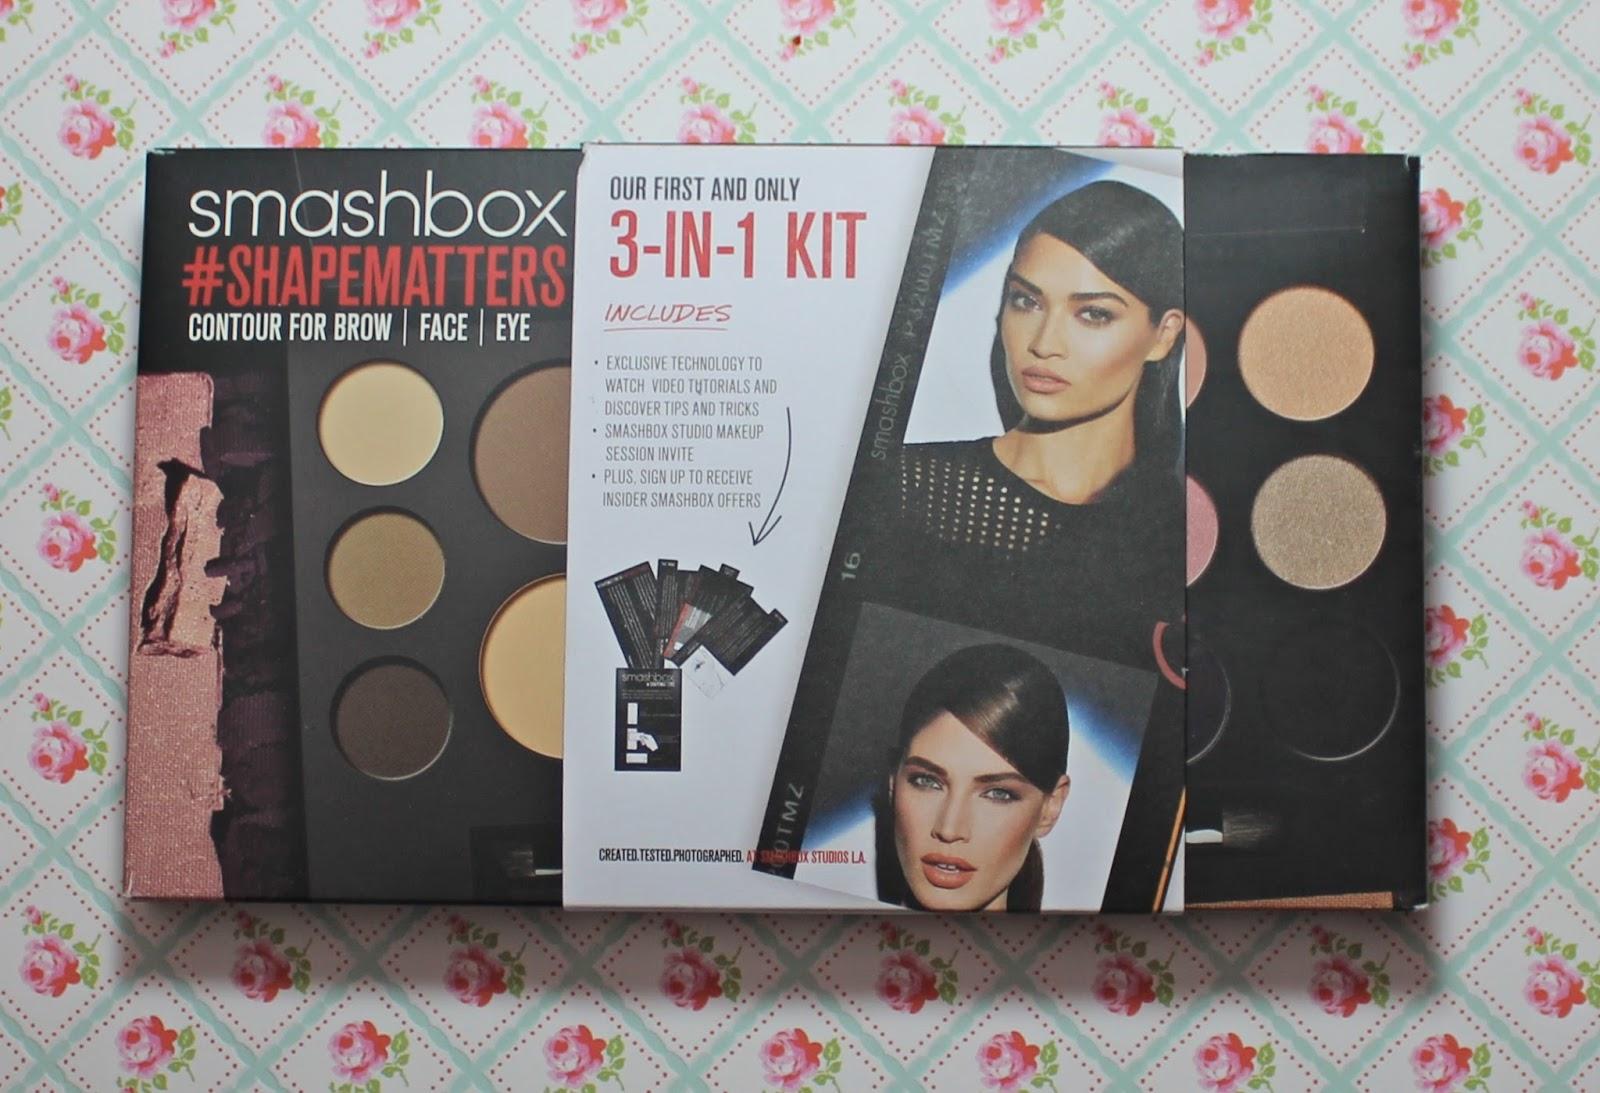 smashbox shapematters palette